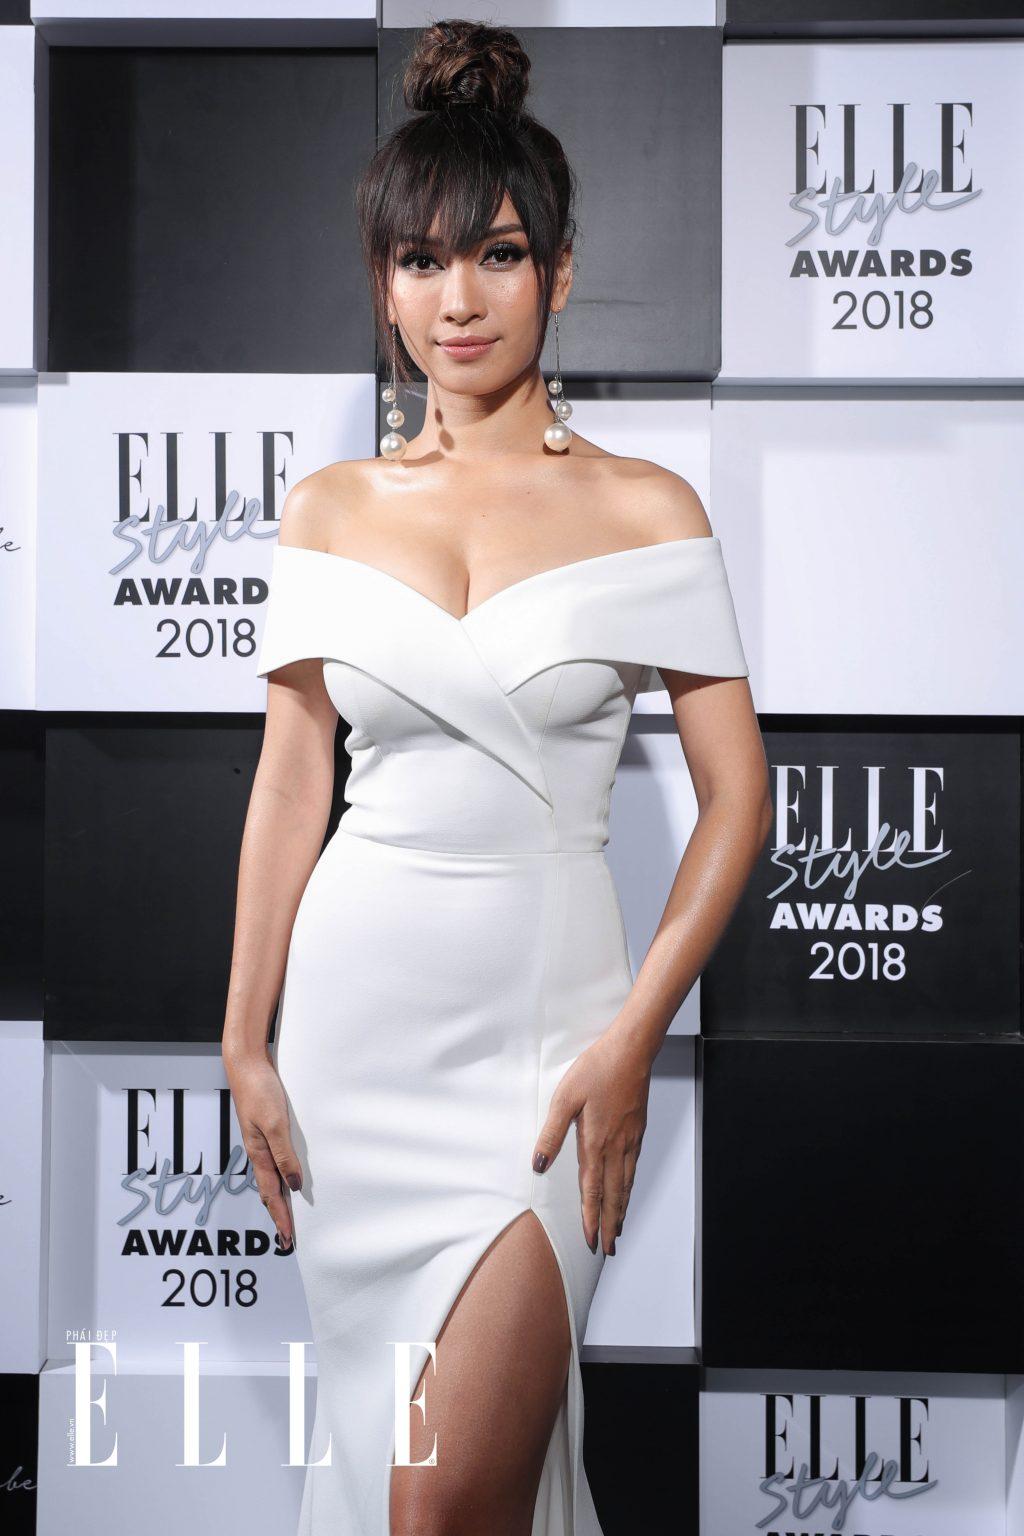 ELLE Style Awards 2018 Ái Phương